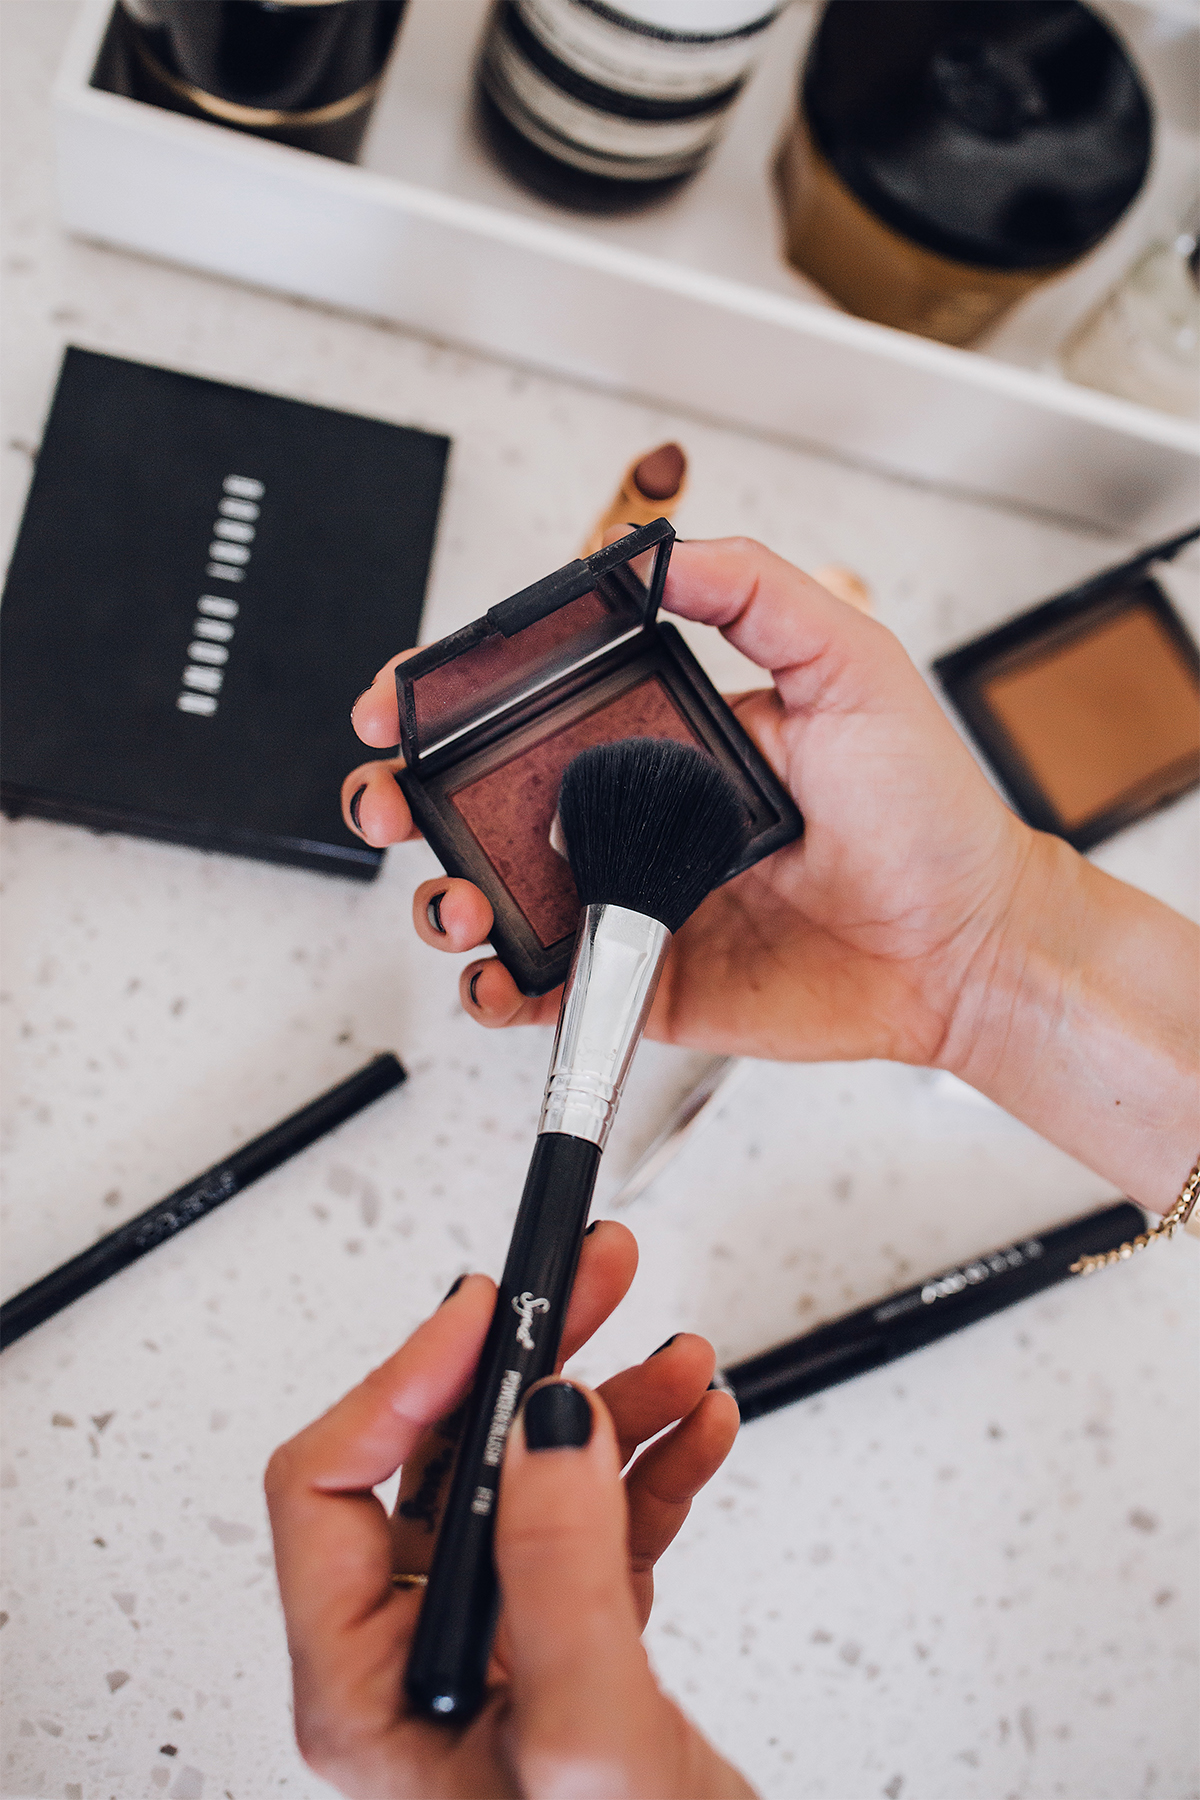 Fashion Jackson Daily Makeup Beauty Routine NARS Blush Sin